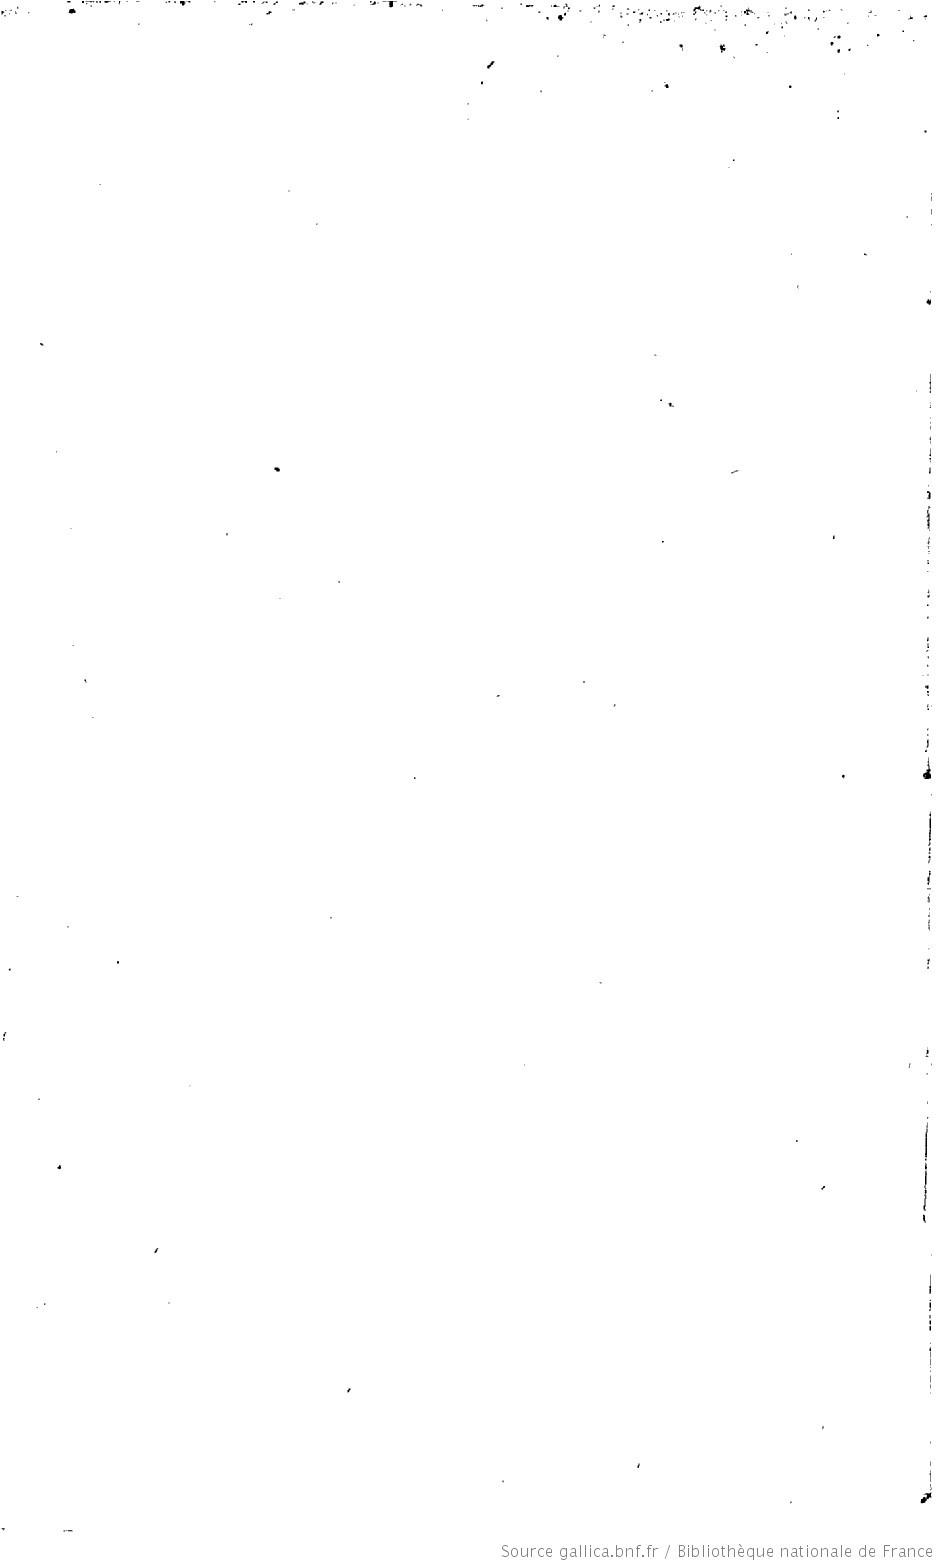 http://gallica.bnf.fr/ark:/12148/bpt6k6102199j.thumbnail.highres.jpg